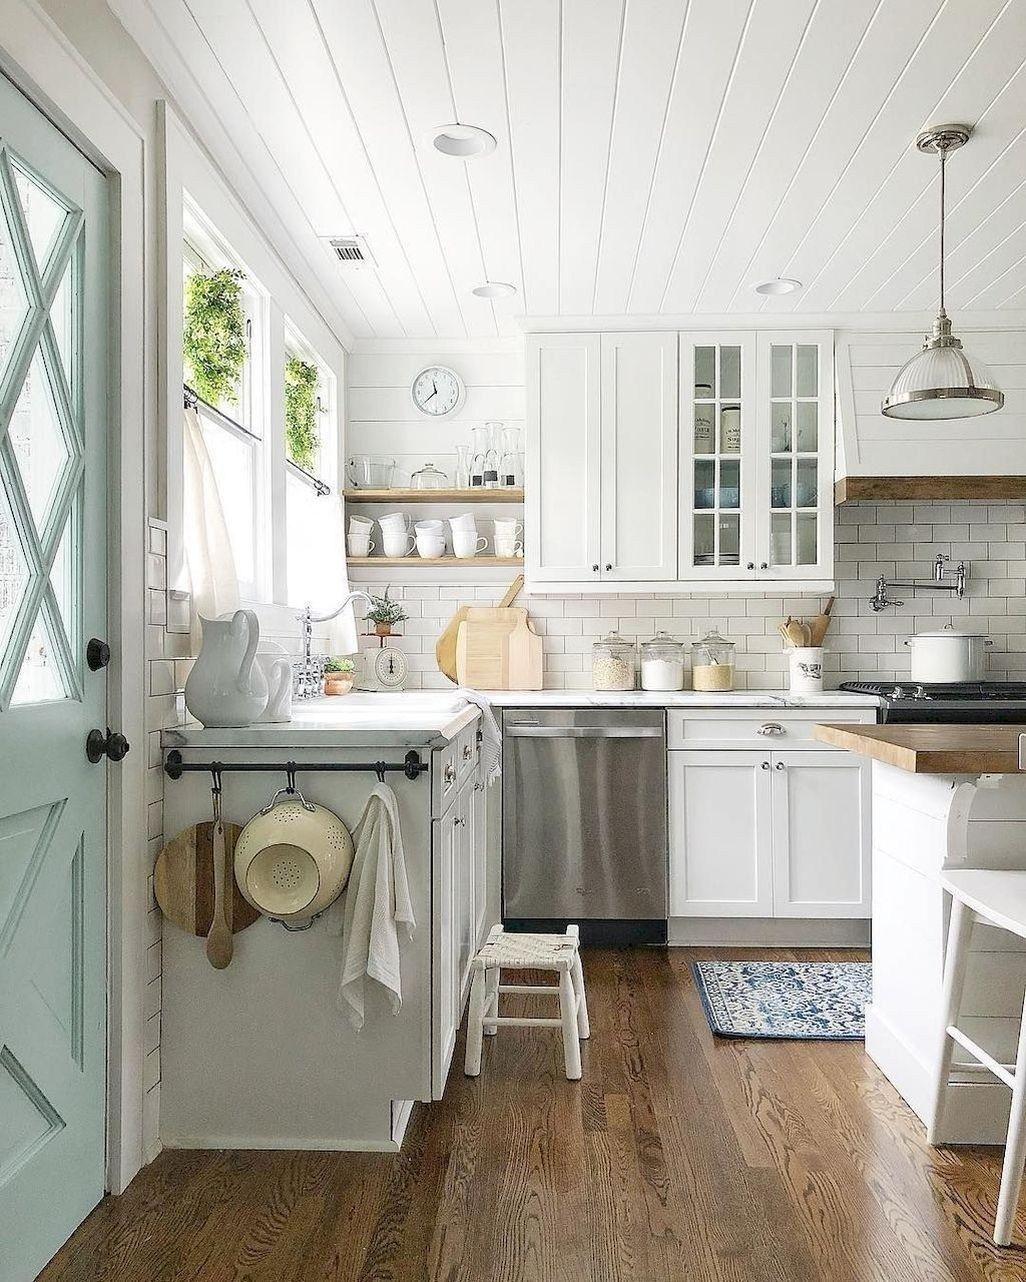 40 Cute Farmhouse Kitchen Decor Ideas | Kitchen cabinets ...